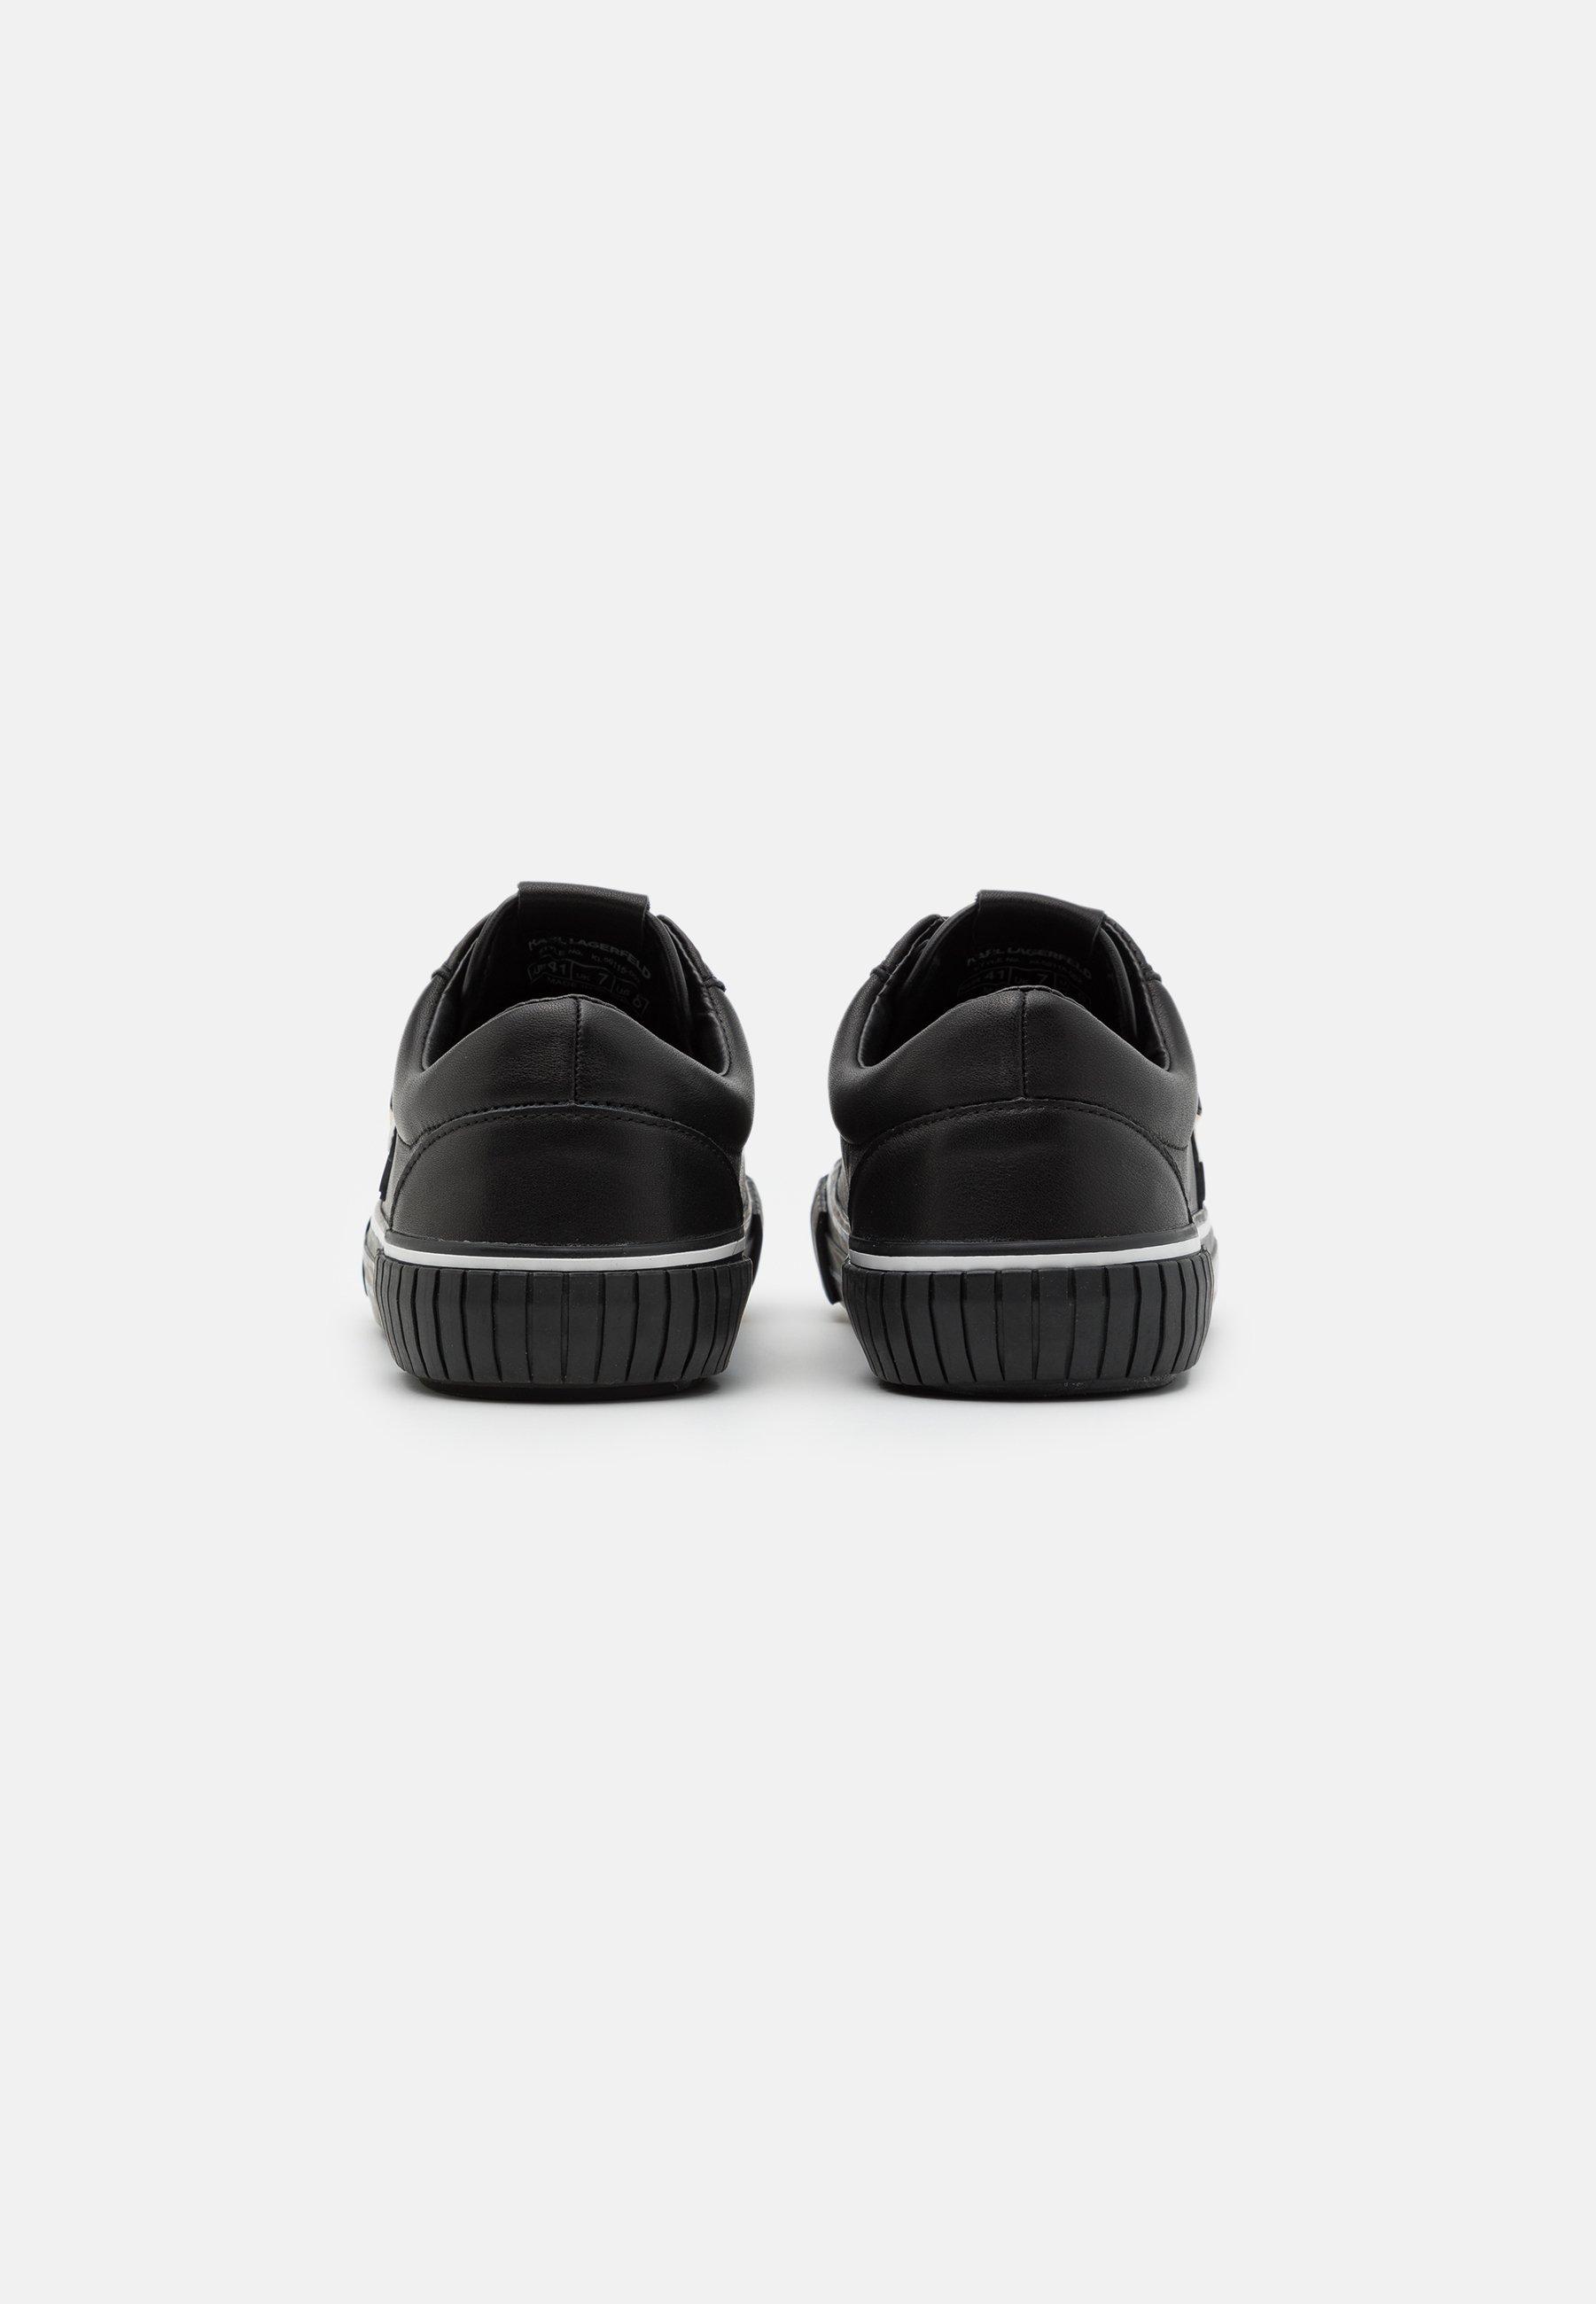 KARL LAGERFELD KAMPUS KARL 3D IKON - Sneaker low - black/schwarz - Herrenschuhe S66F3